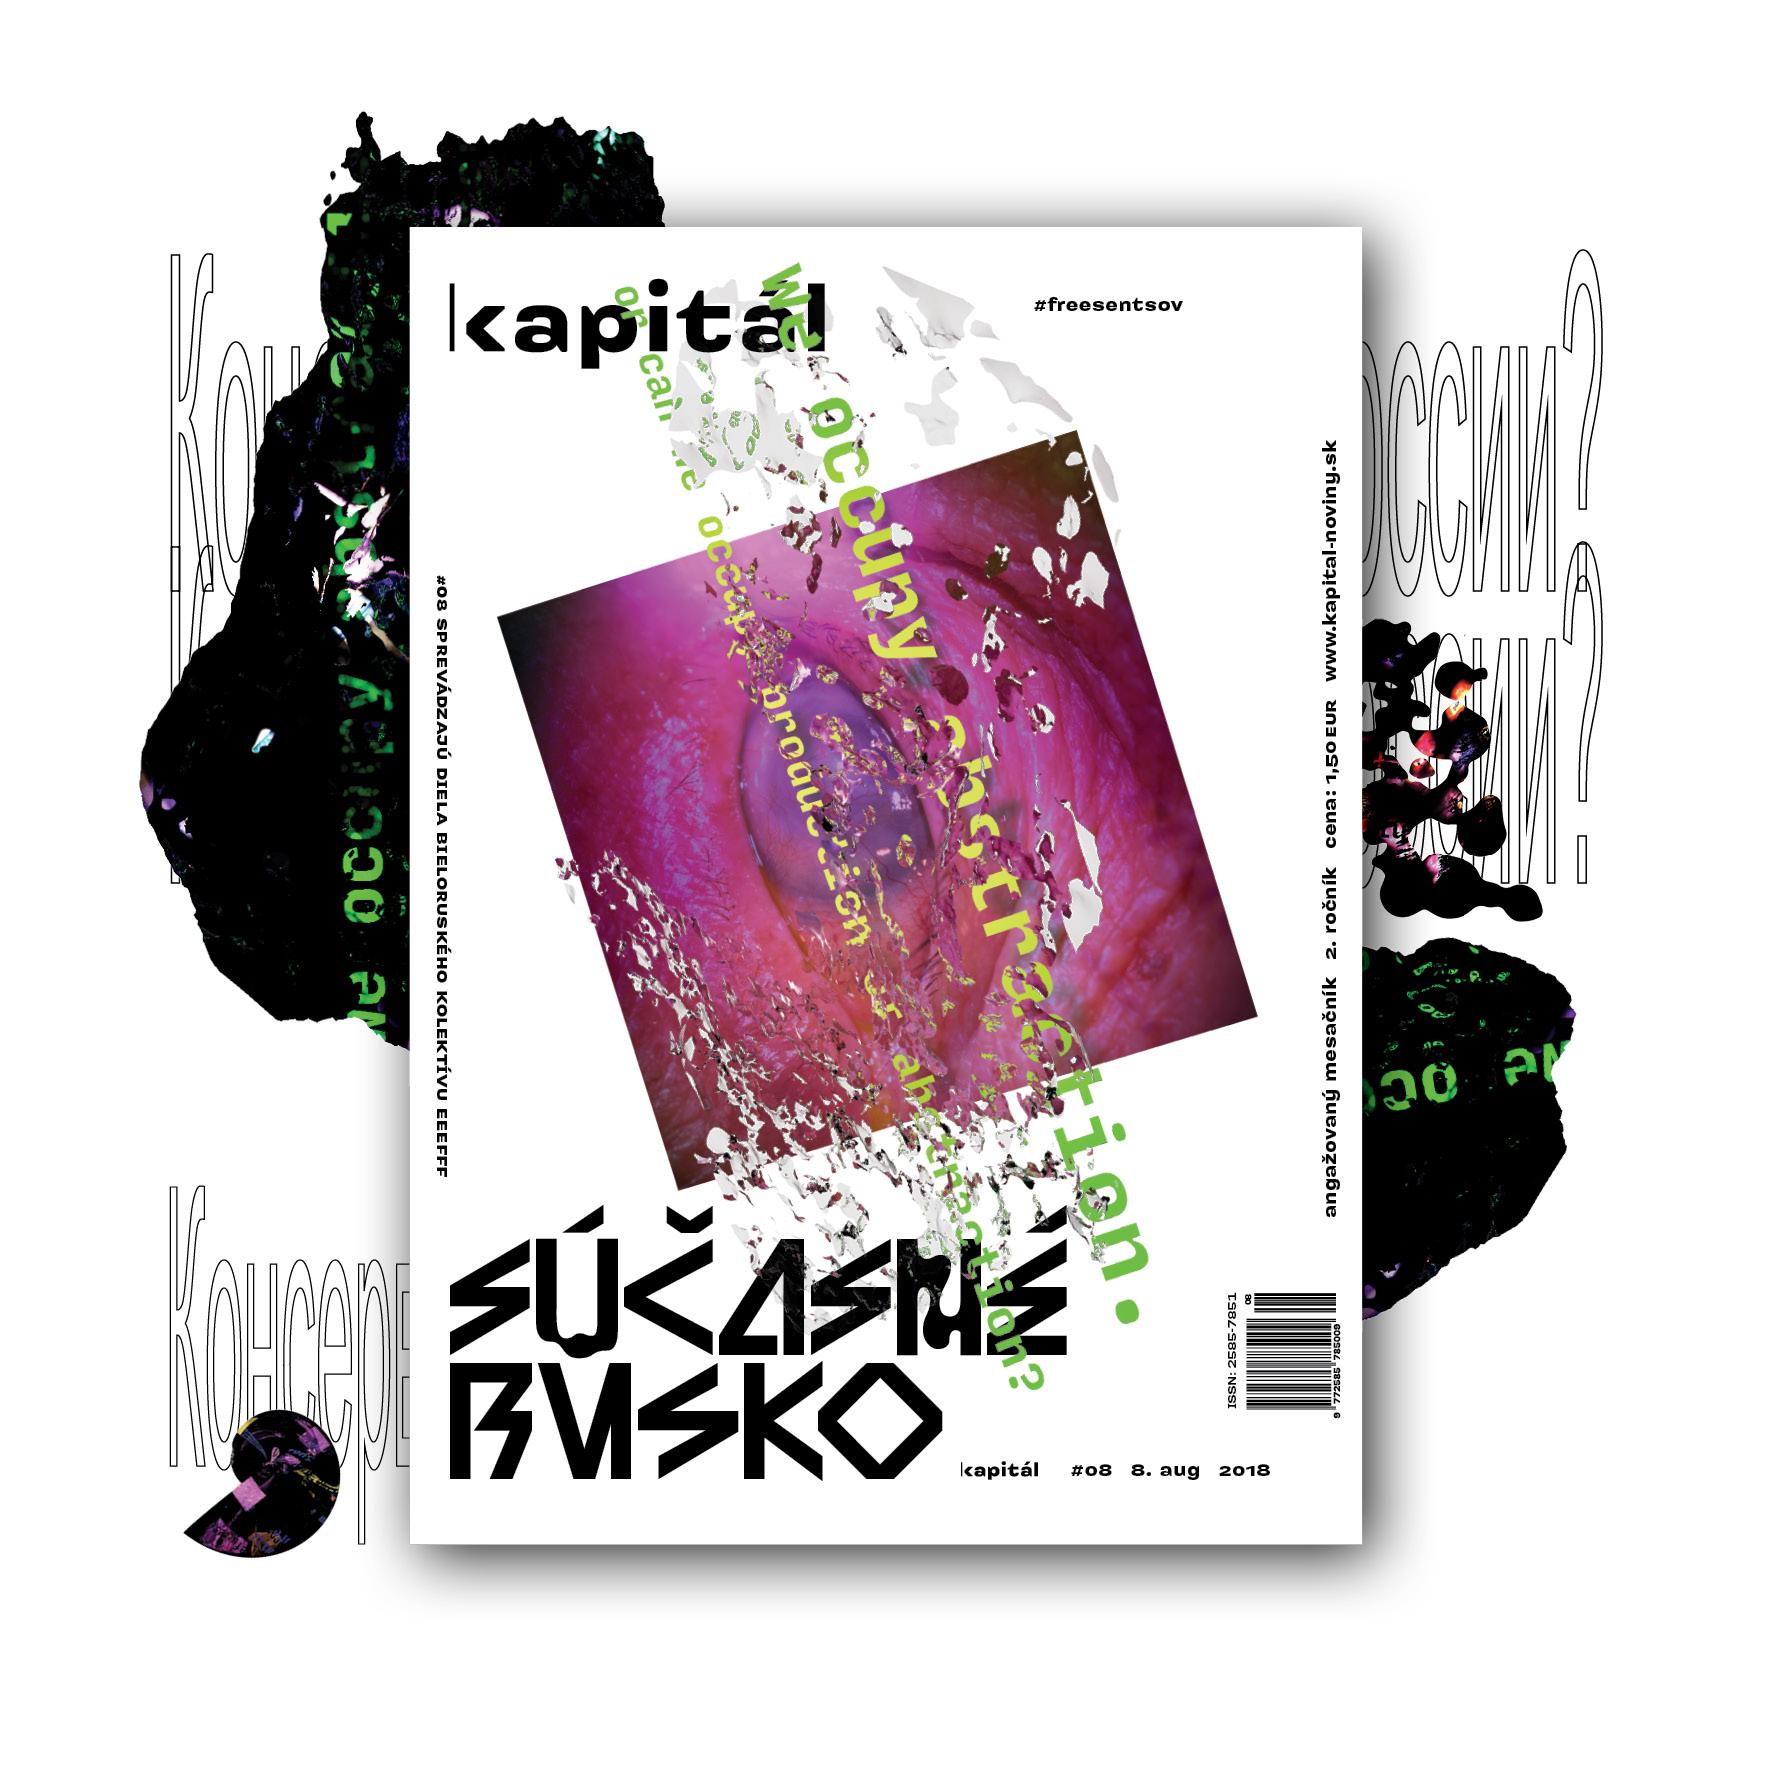 https://i1.wp.com/kapital-noviny.sk/wp-content/uploads/2018/09/1806_INSTA_KAPITAL-062.jpg?fit=1772%2C1772&ssl=1